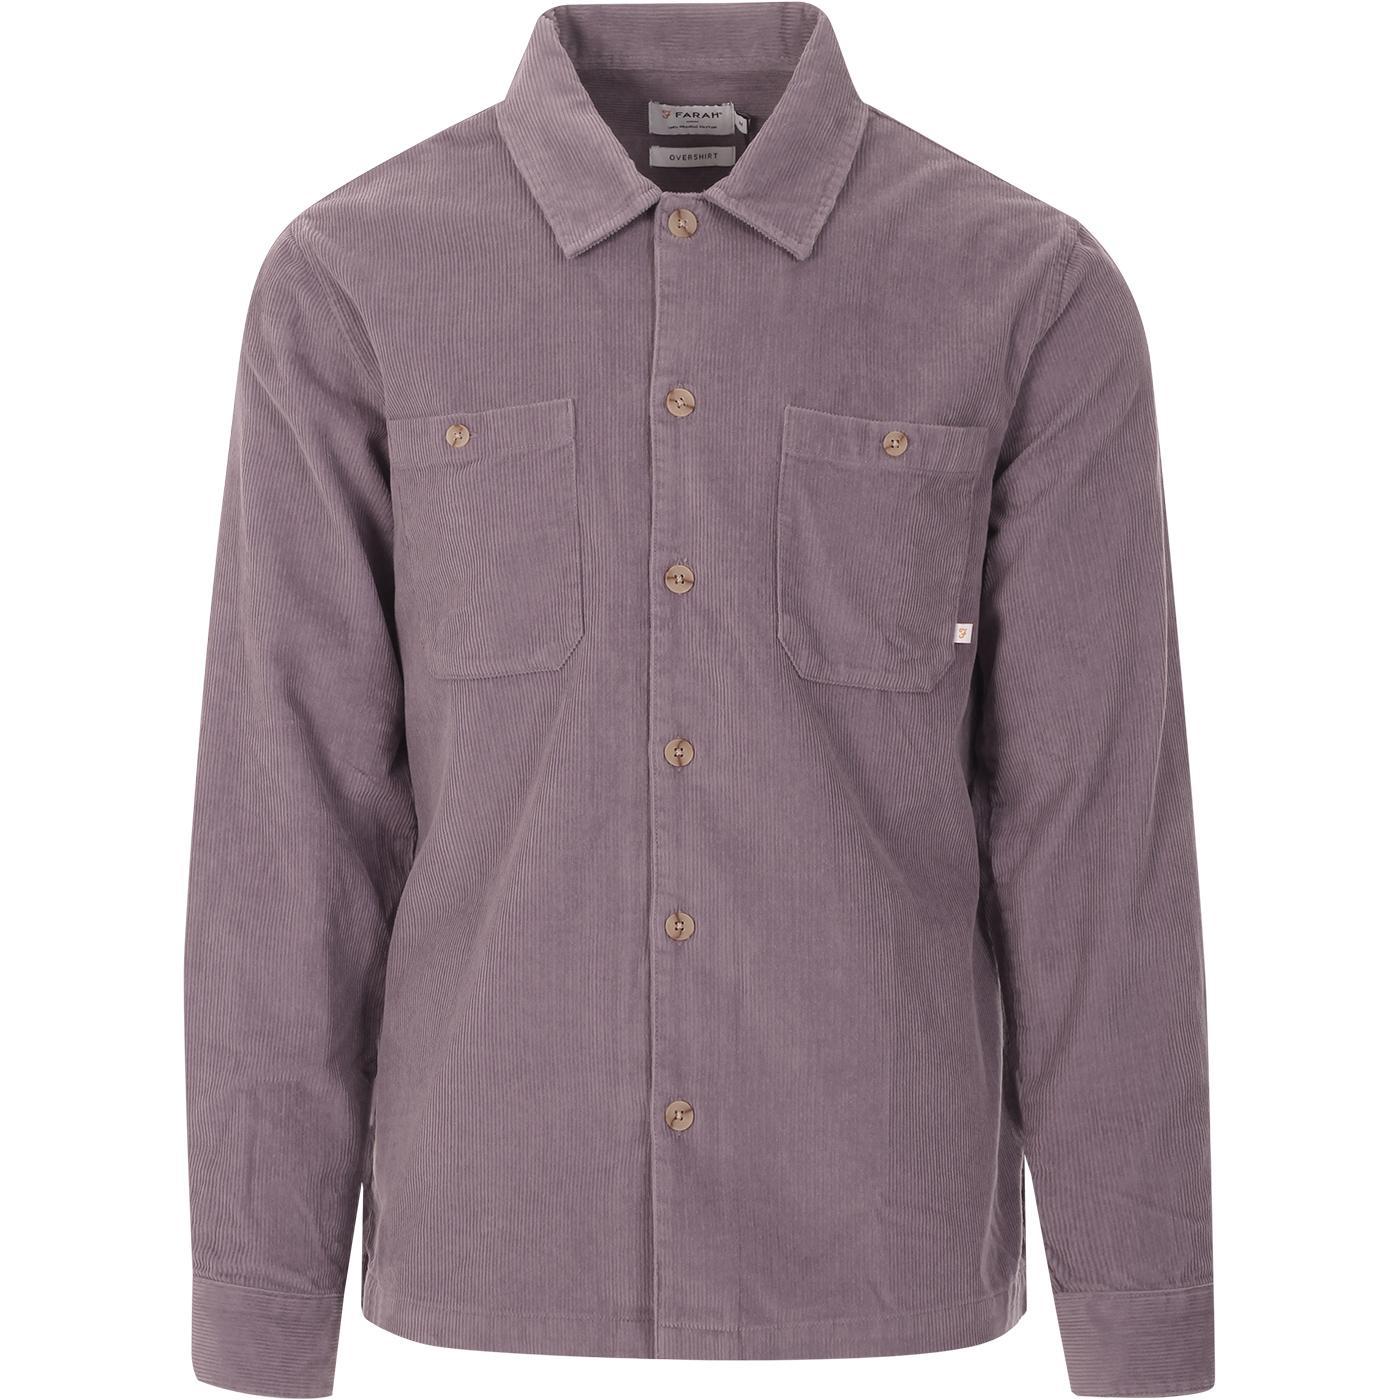 Amberson FARAH Retro Cord Overshirt (Purple Ash)